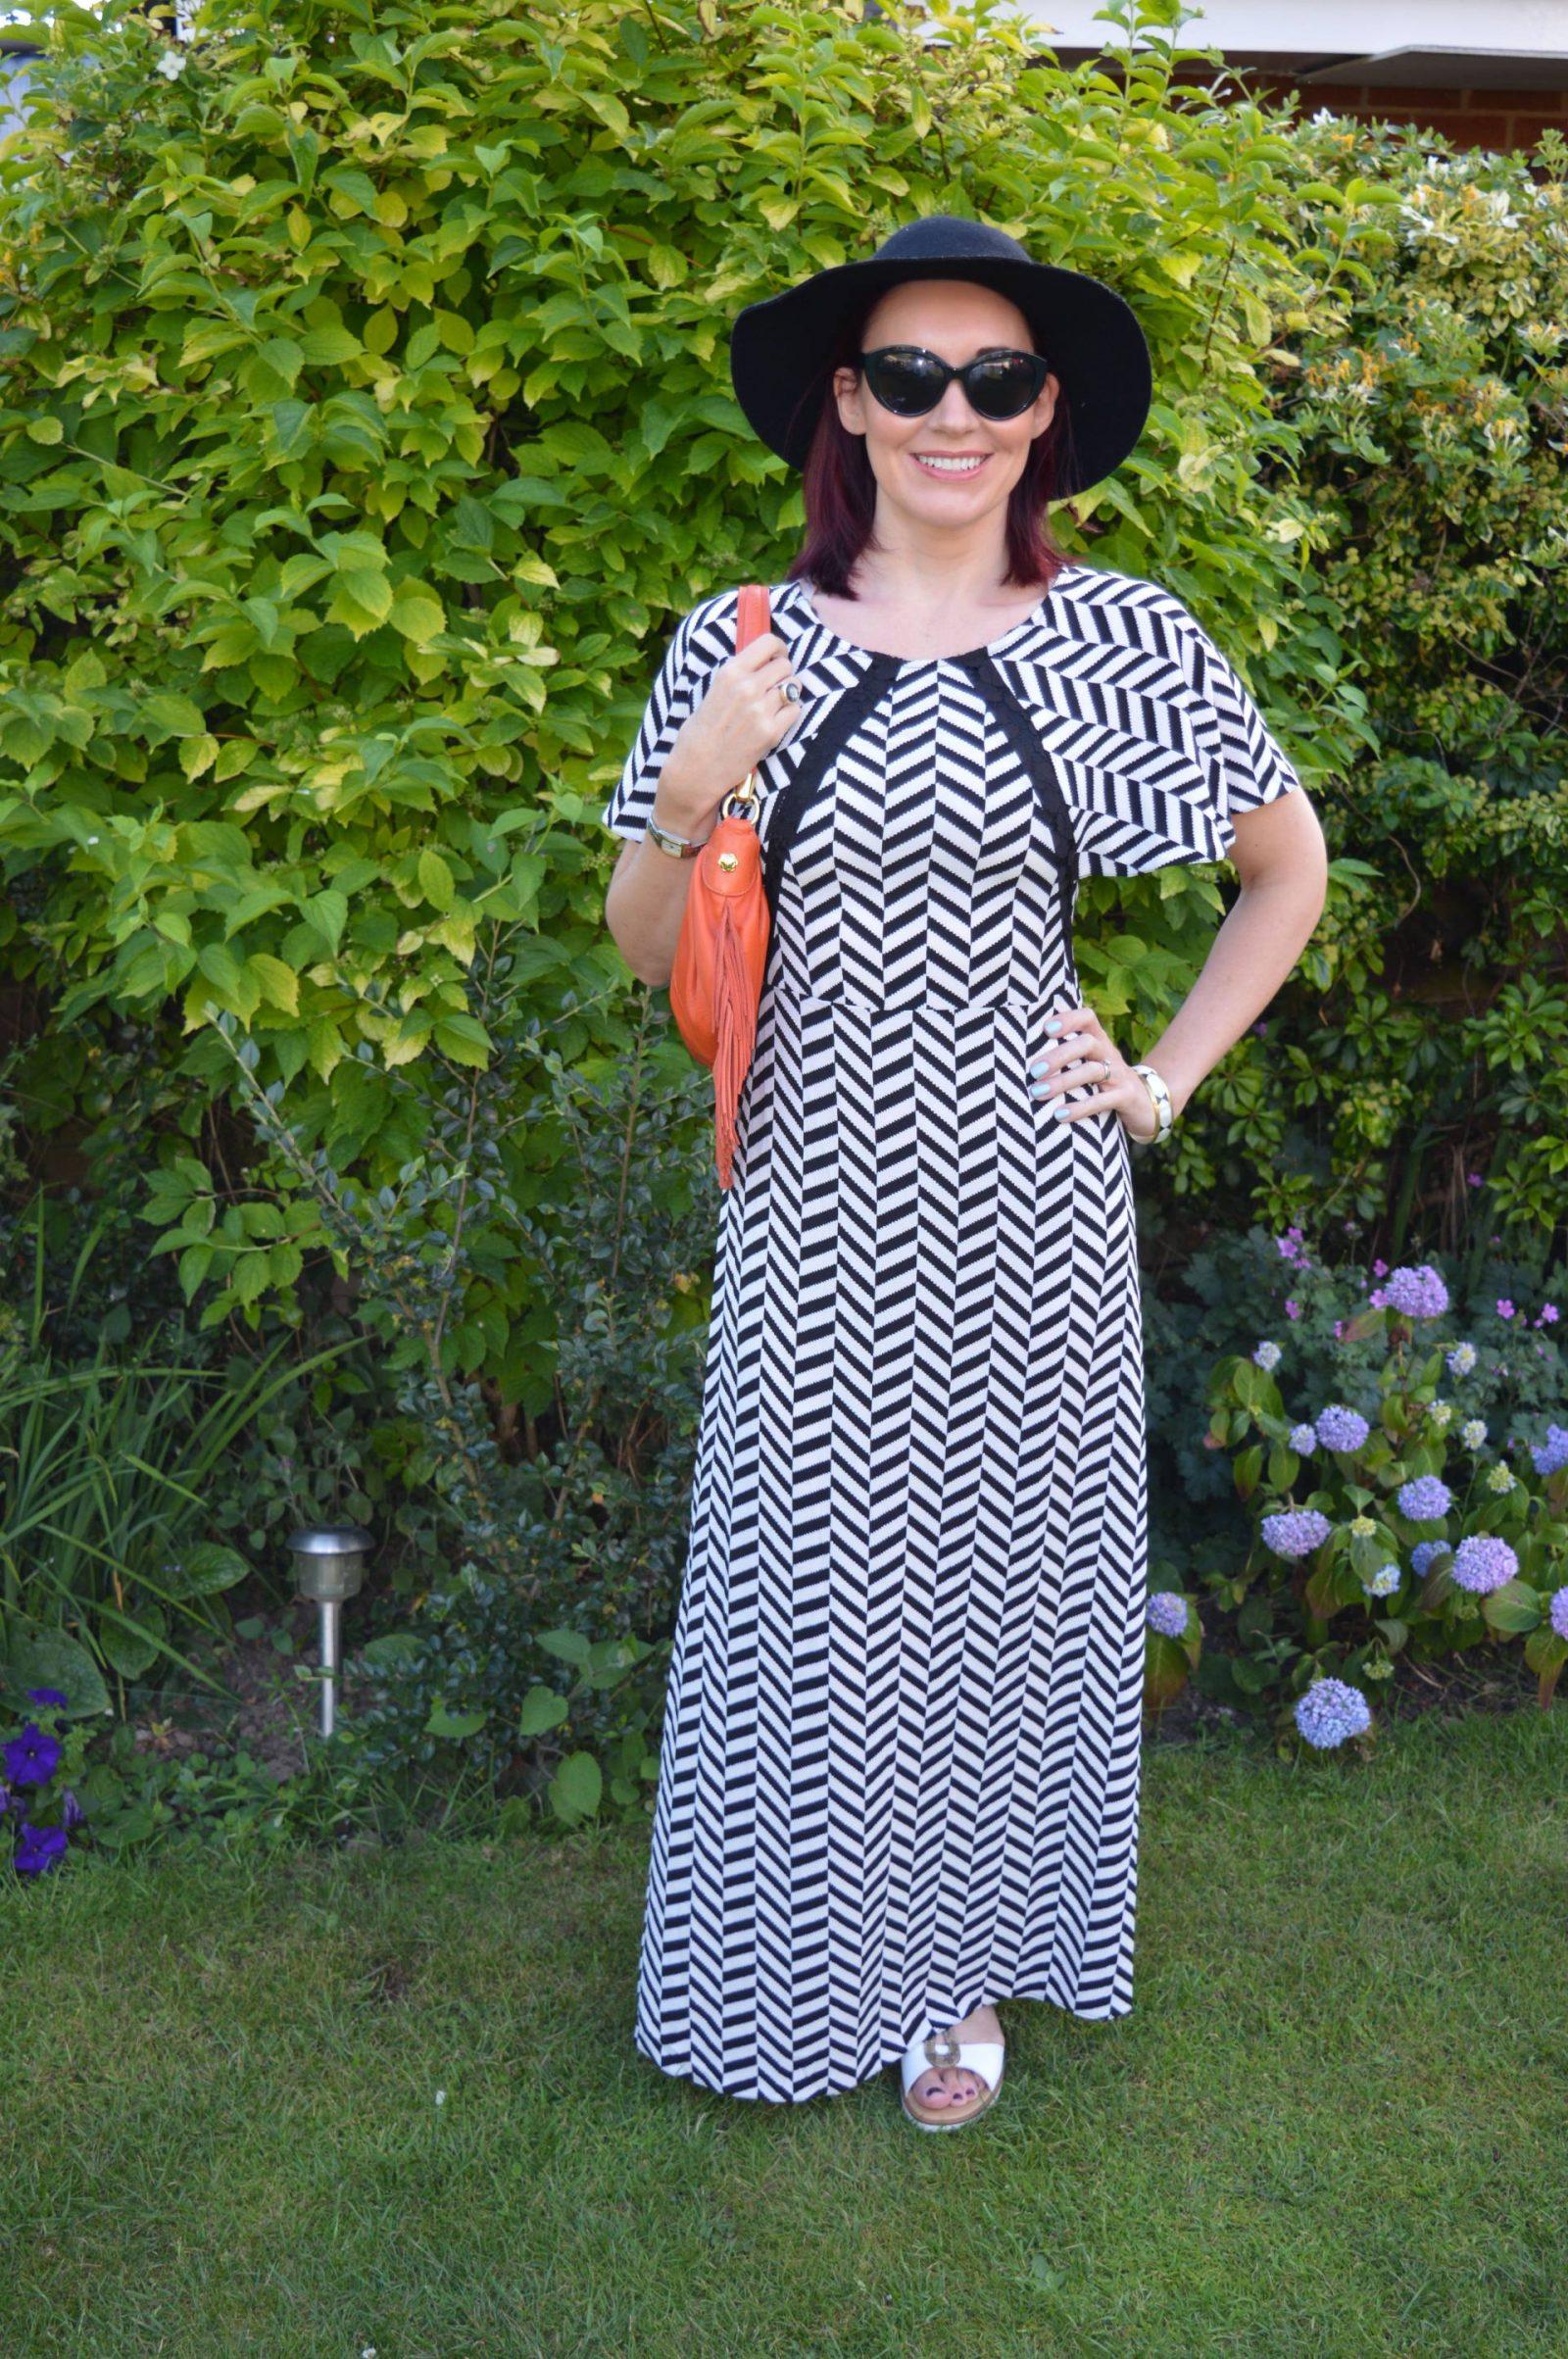 Liquorish Black and White Maxi Dress With a Wide Brim Hat